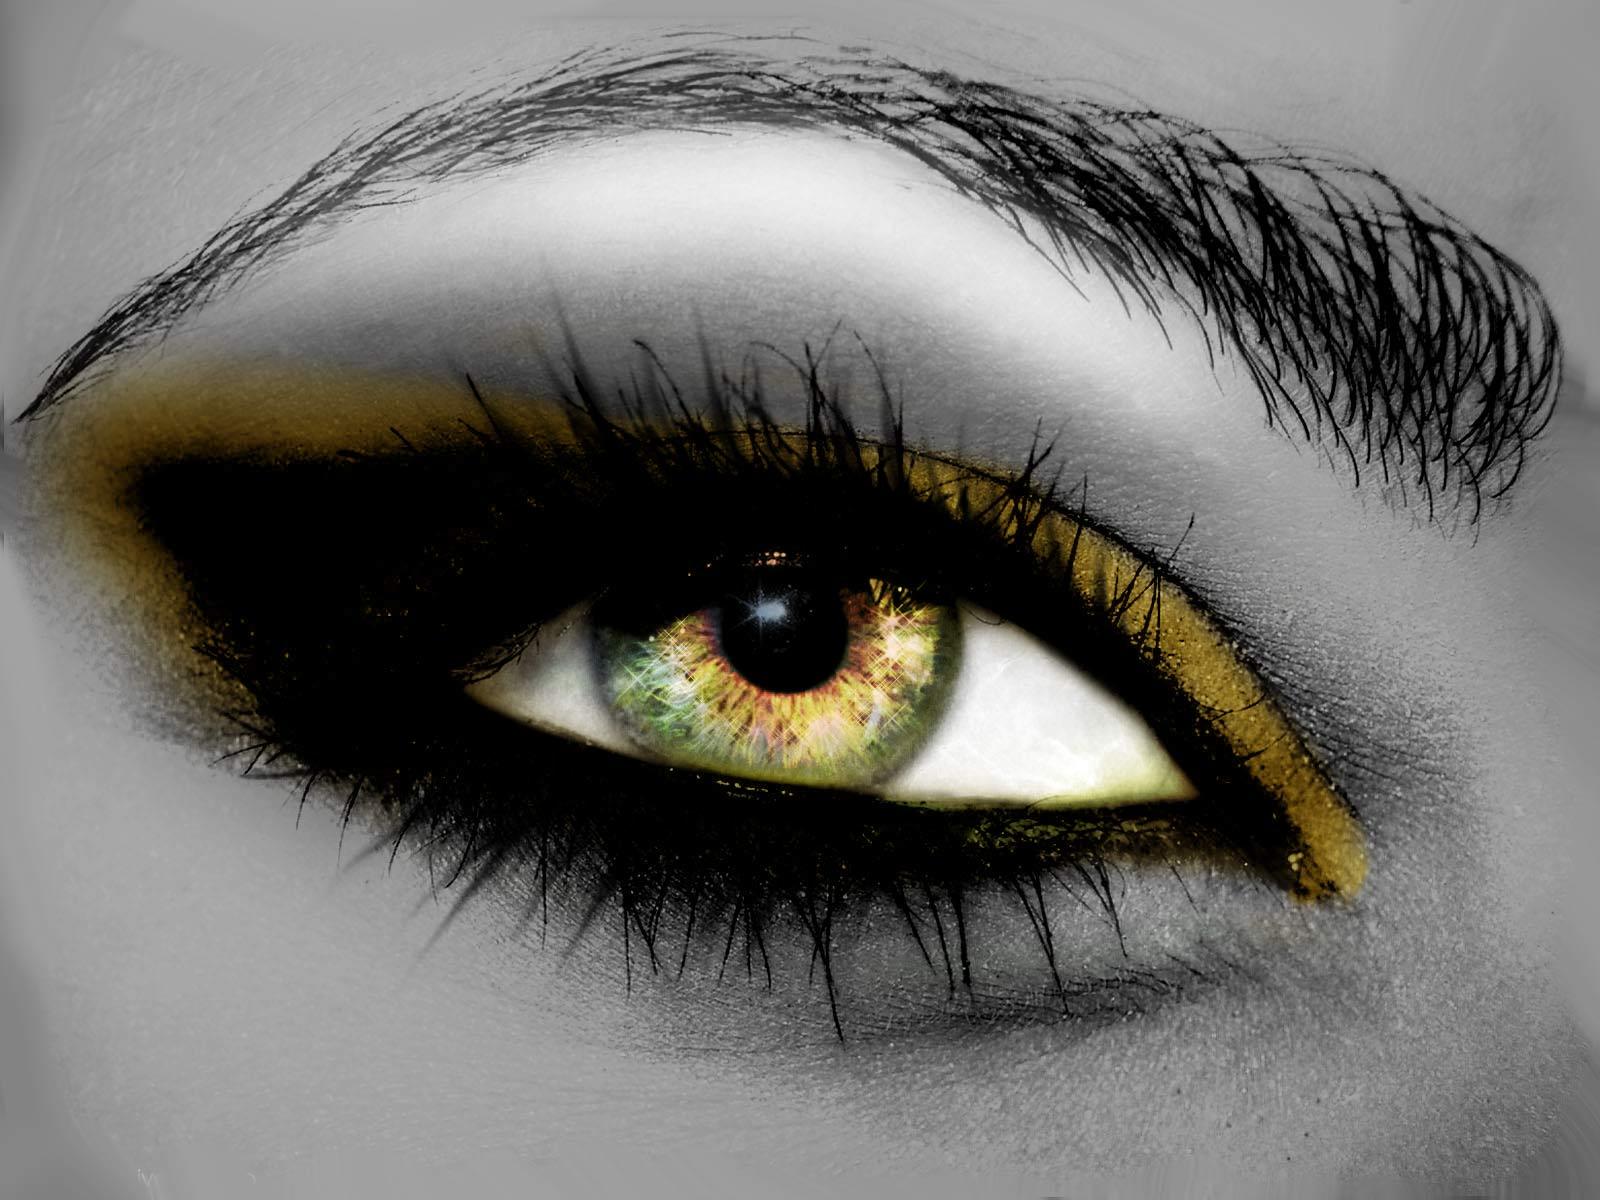 http://2.bp.blogspot.com/-WcTo9ldCU9I/TVu3no9K_DI/AAAAAAAAFek/urA2WcZMls8/s1600/Sparkling_Eye-3d-designed-actress-wallpapers-urdu-poetry-designed-poetry-parveen-shakir-faraz-ghalib-mohsin-naqvi-sad-poetry-muhabbat-love-romantic-high-quality-poetry-faiz-ahmed-faiz-poetry-girl.jpg